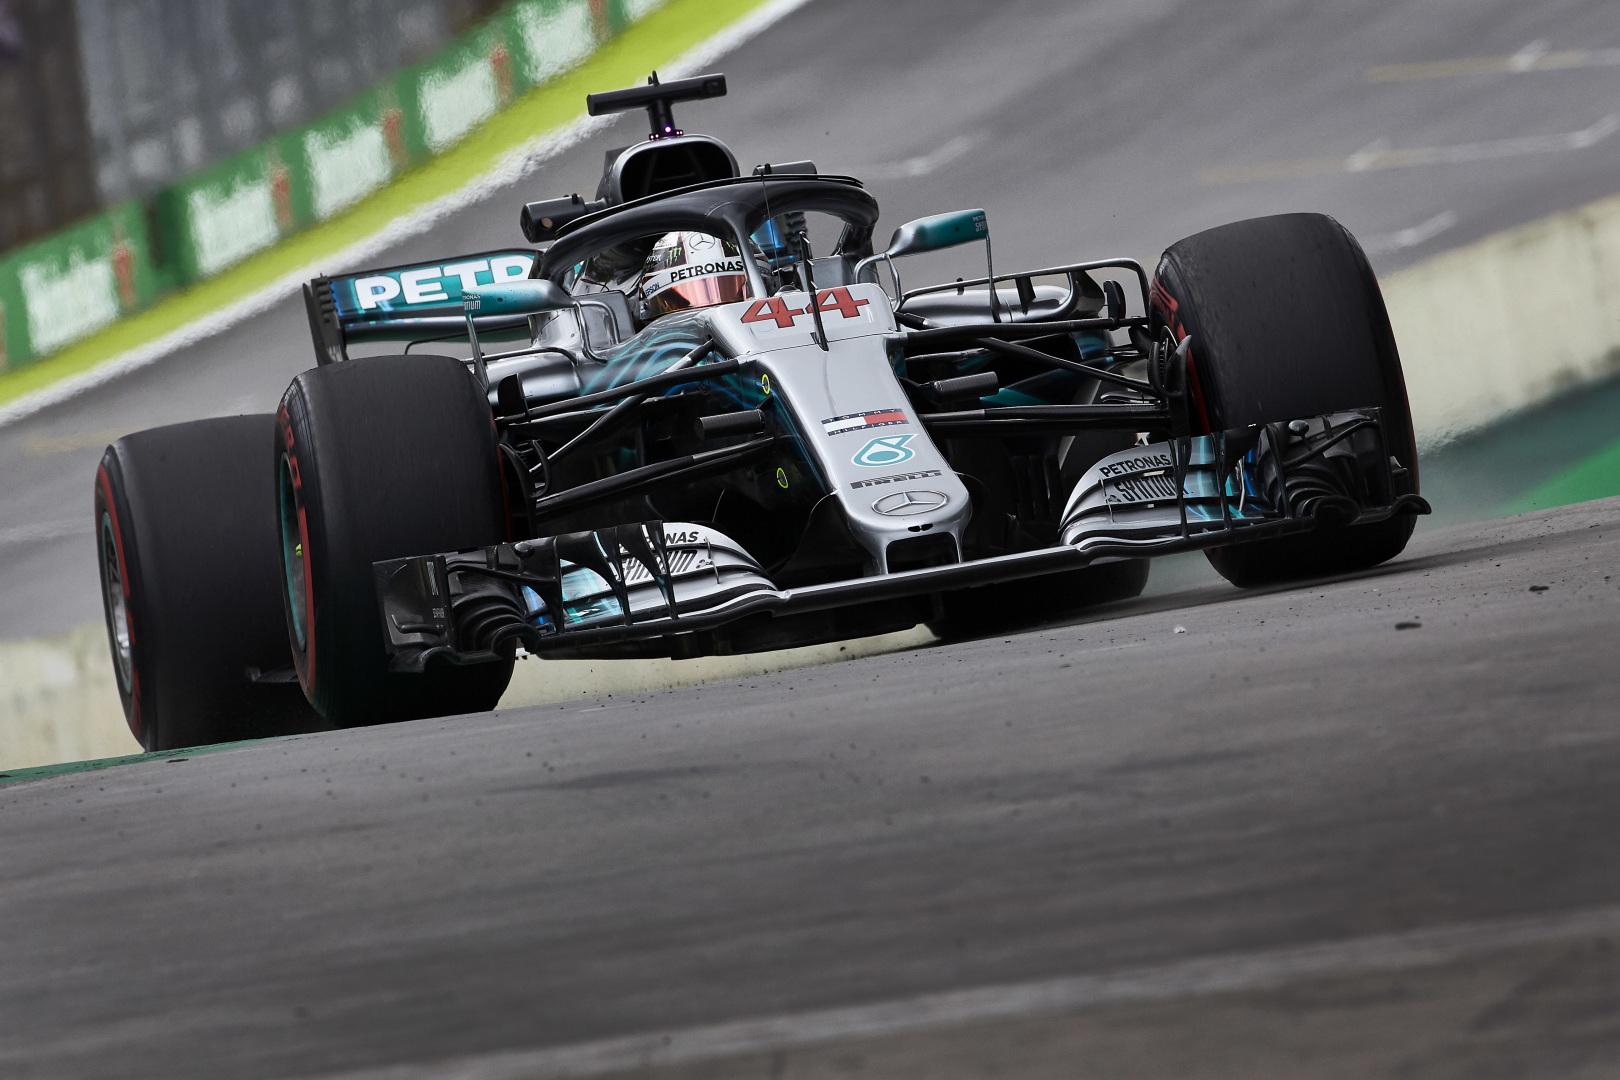 Lewis Hamilton, racingline.hu, racingline, racinglinehu